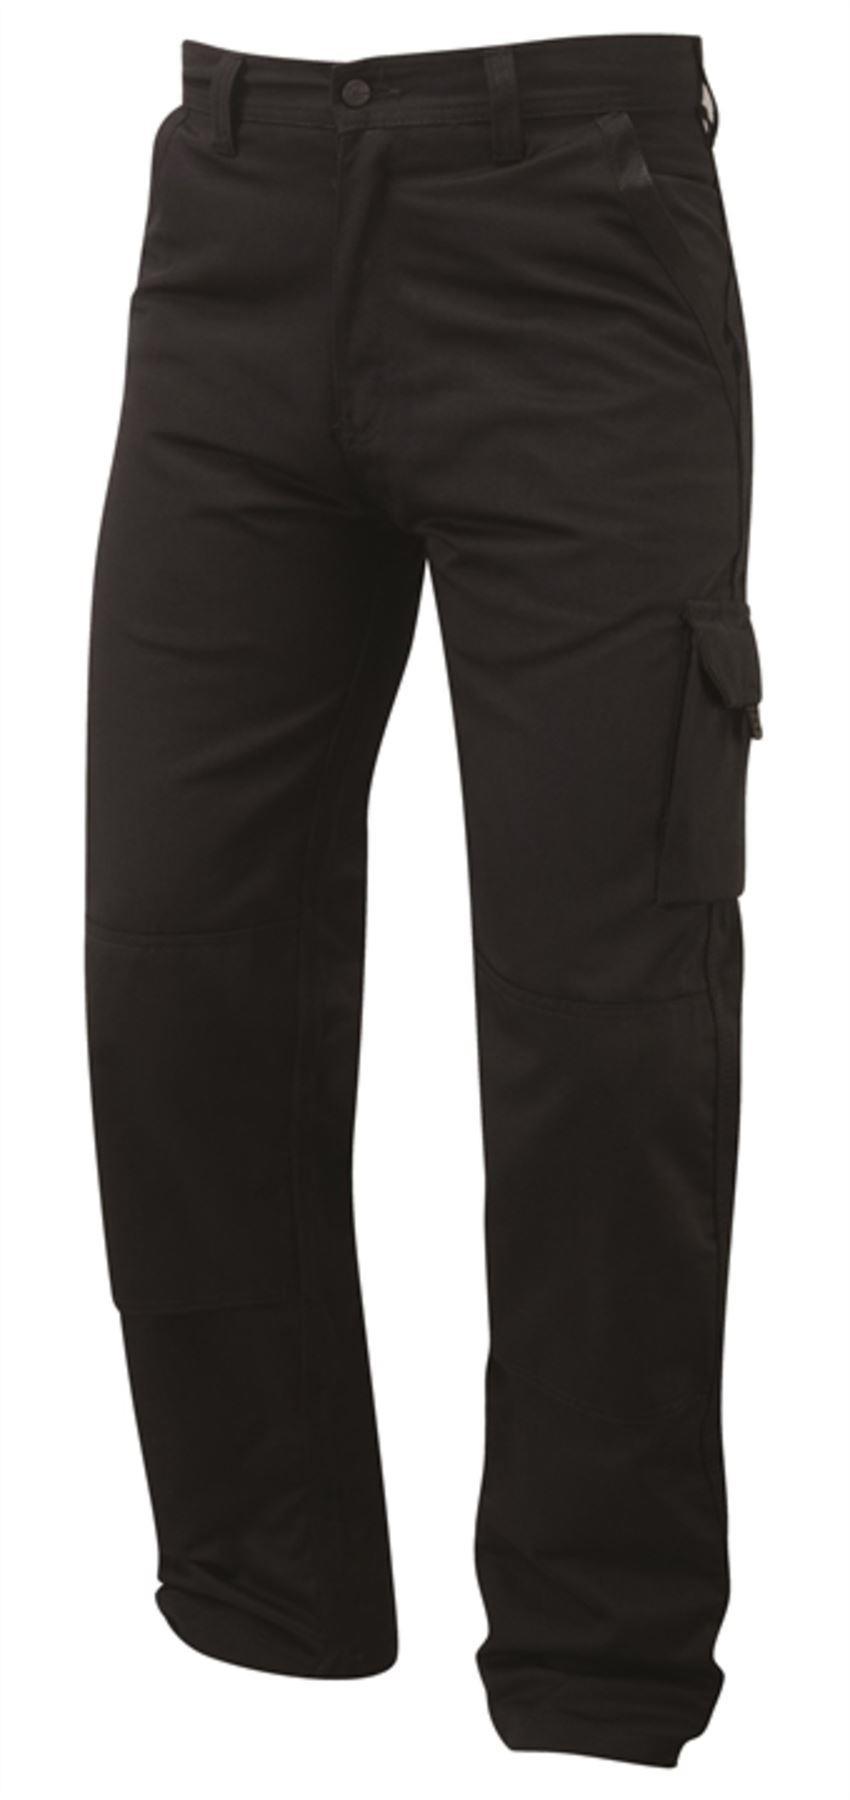 Orn Heron Kneepad Combat Trousers - Black|42W32L